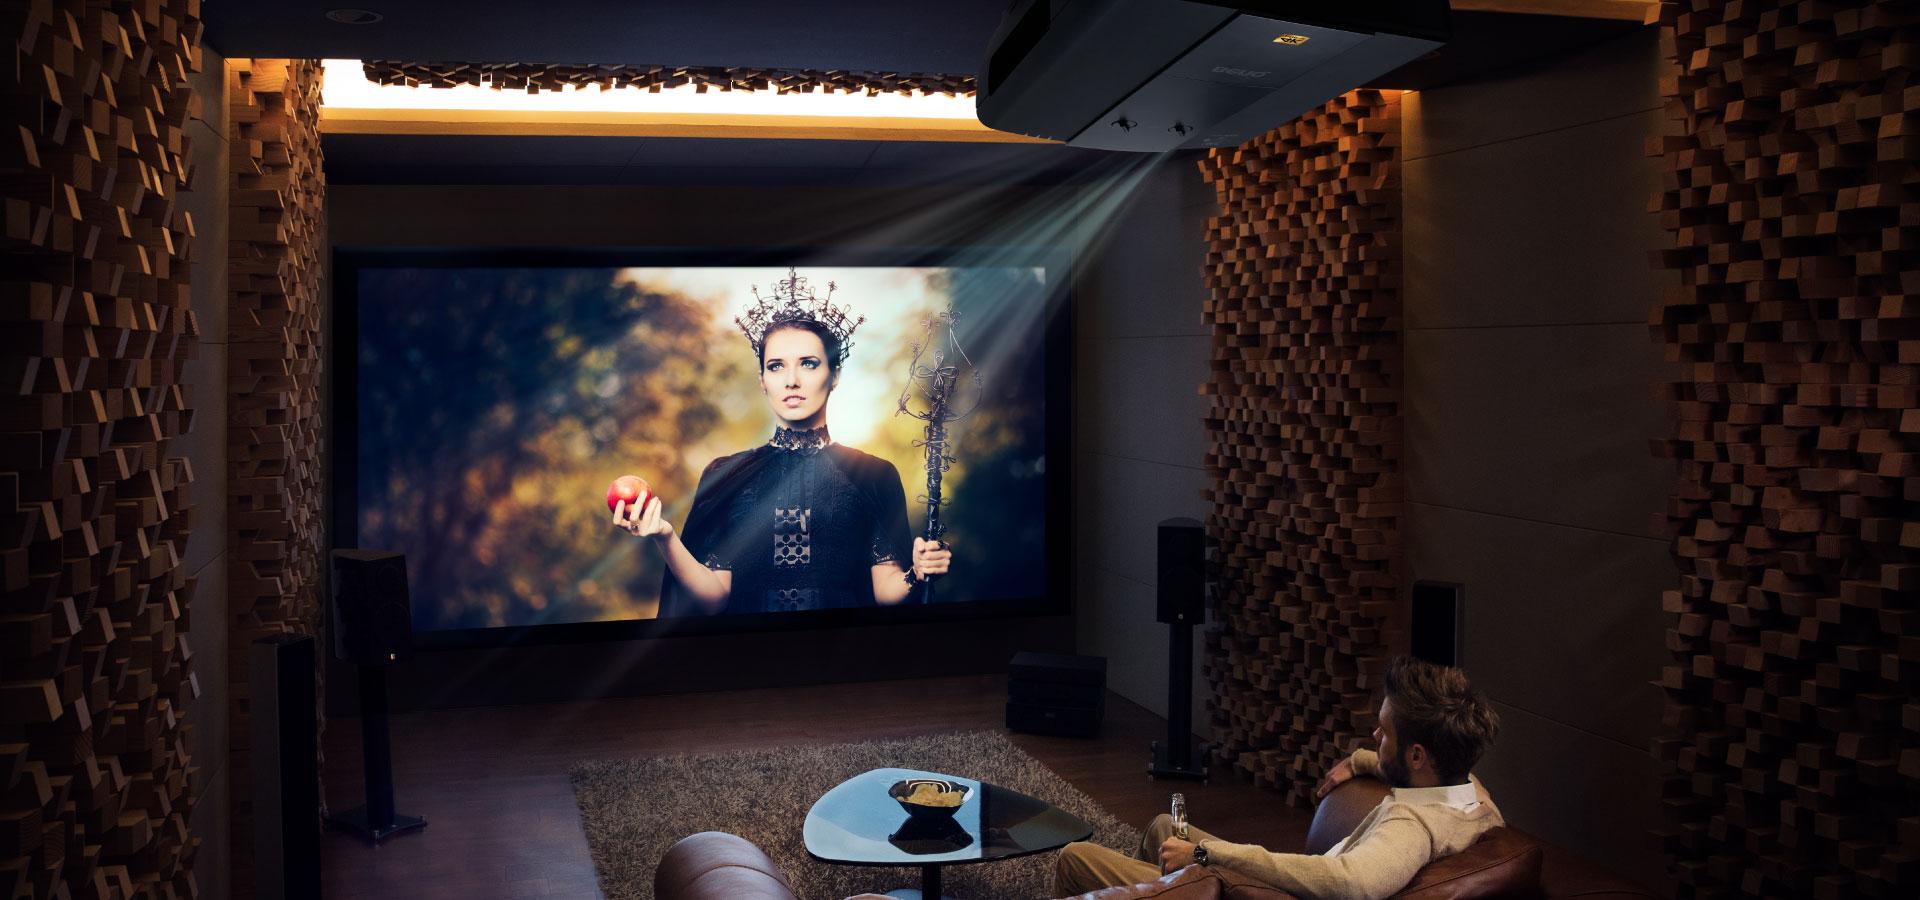 W20H CinePro Series with 20K,THX Pro Cinema Projector   BenQ ...